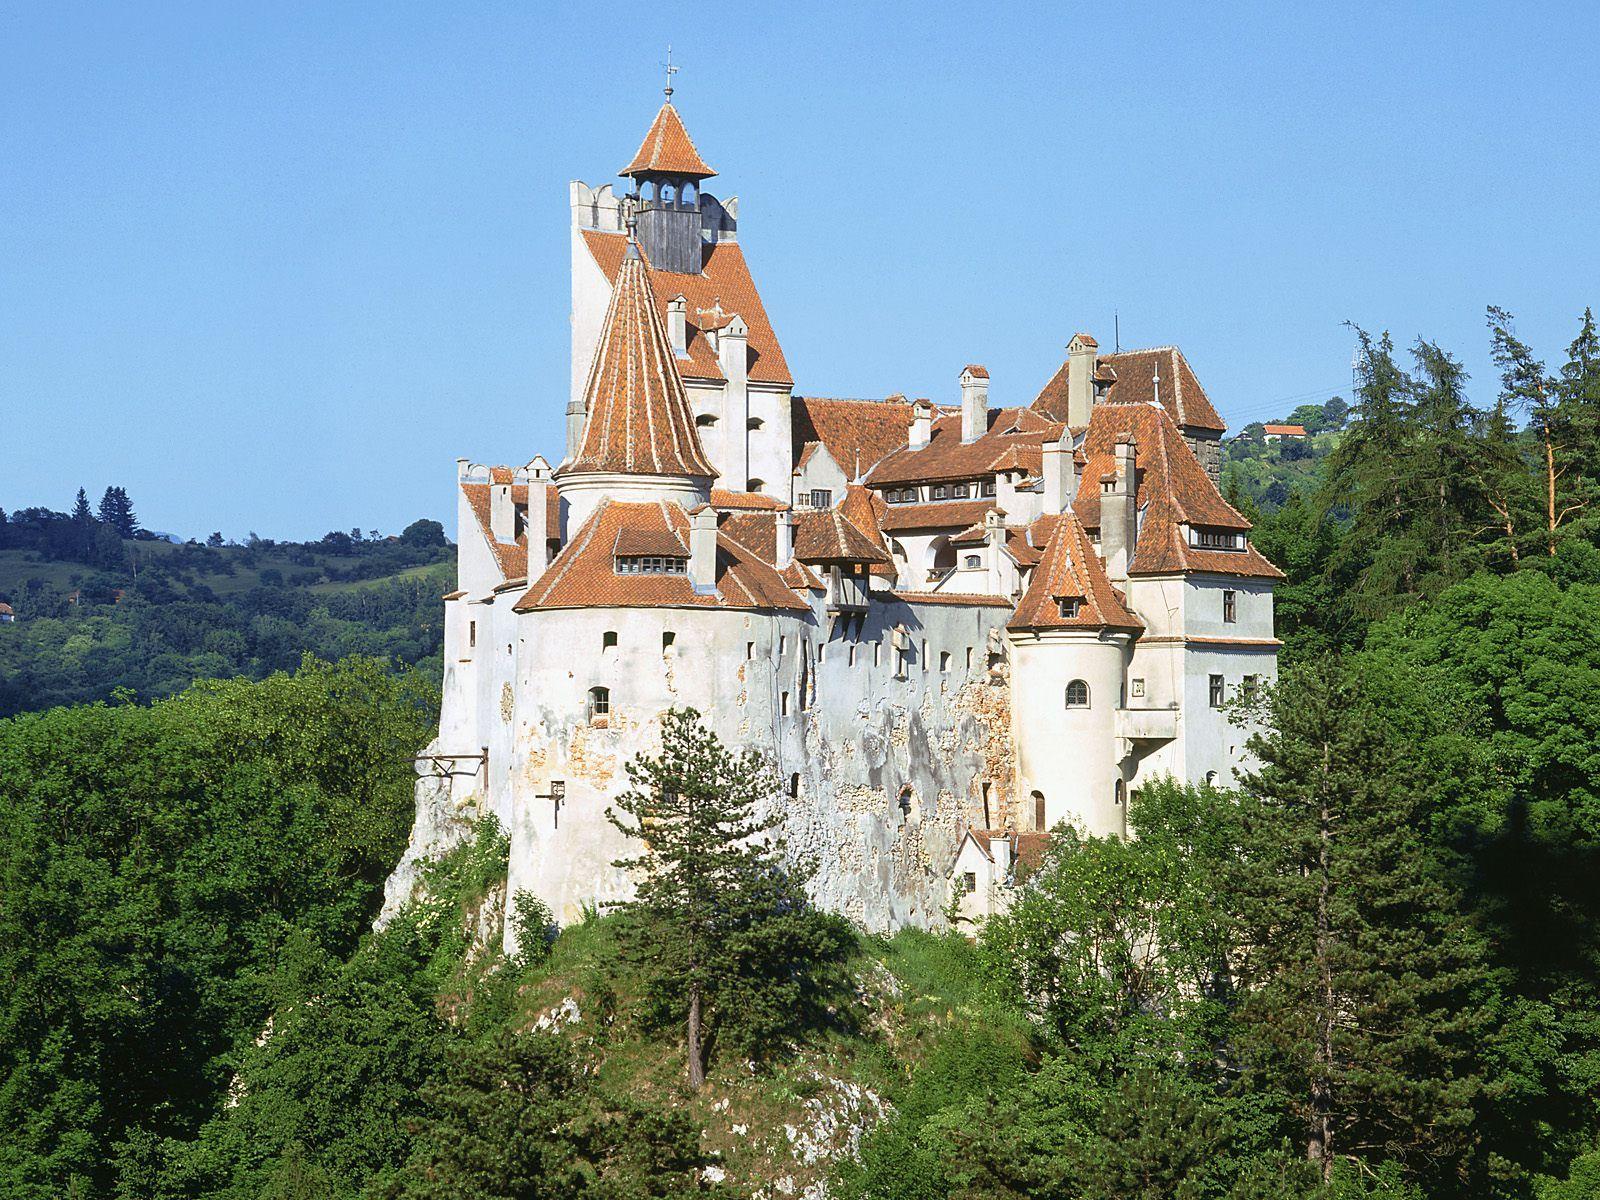 places Bran draculas Castle Romania desktop wallpaper nr 32352 1600x1200